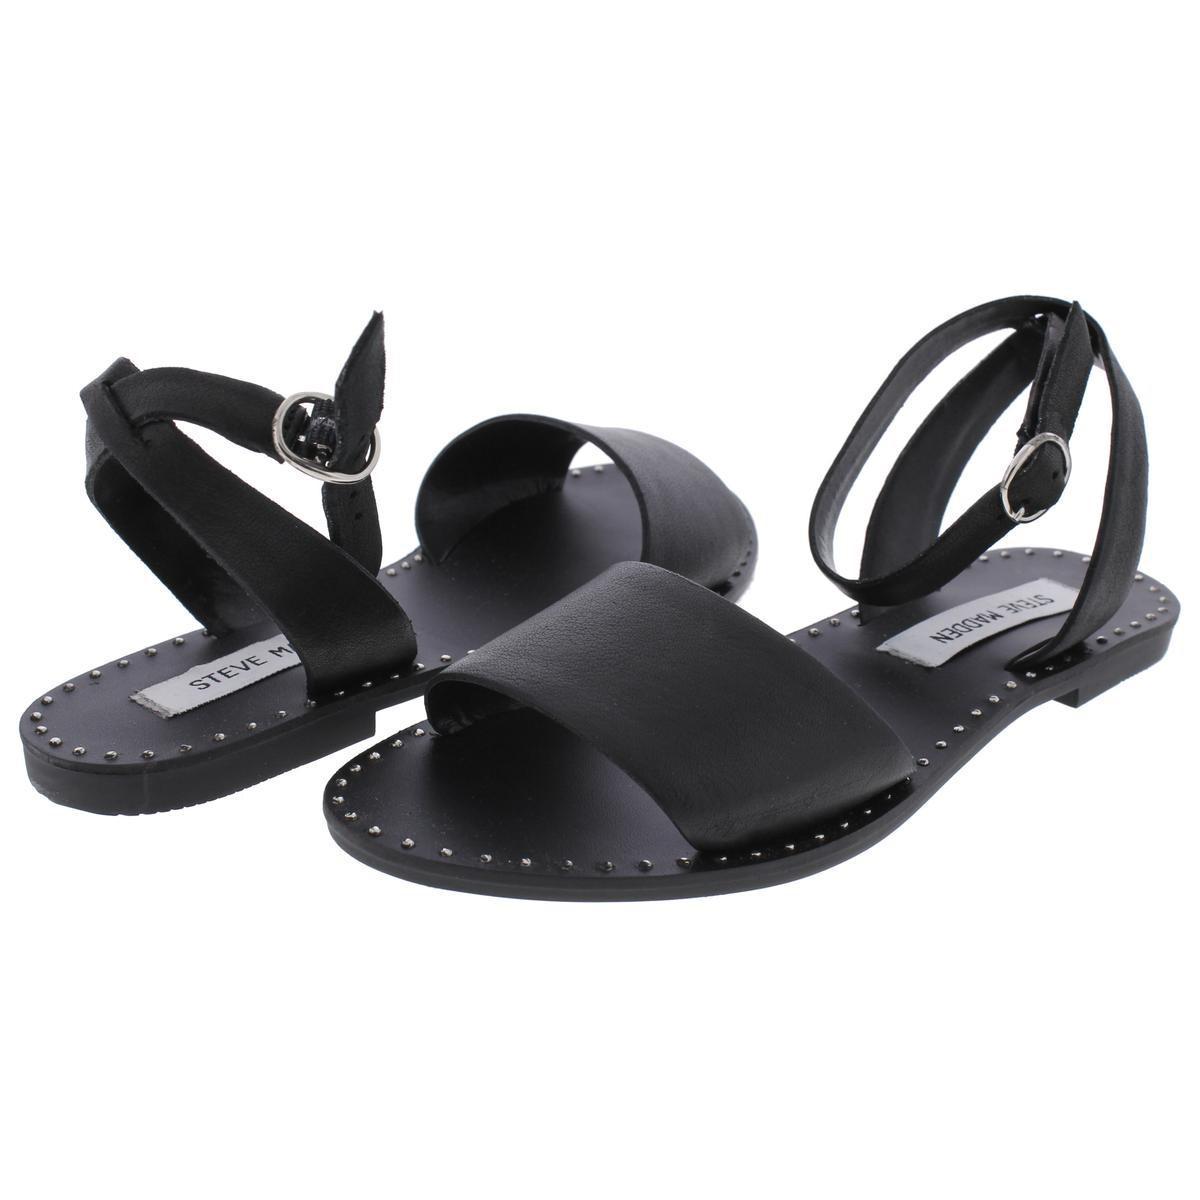 5f2f9c4e724b1 Lyst - Steve Madden Danny Open Toe Studded Flat Sandals in Black